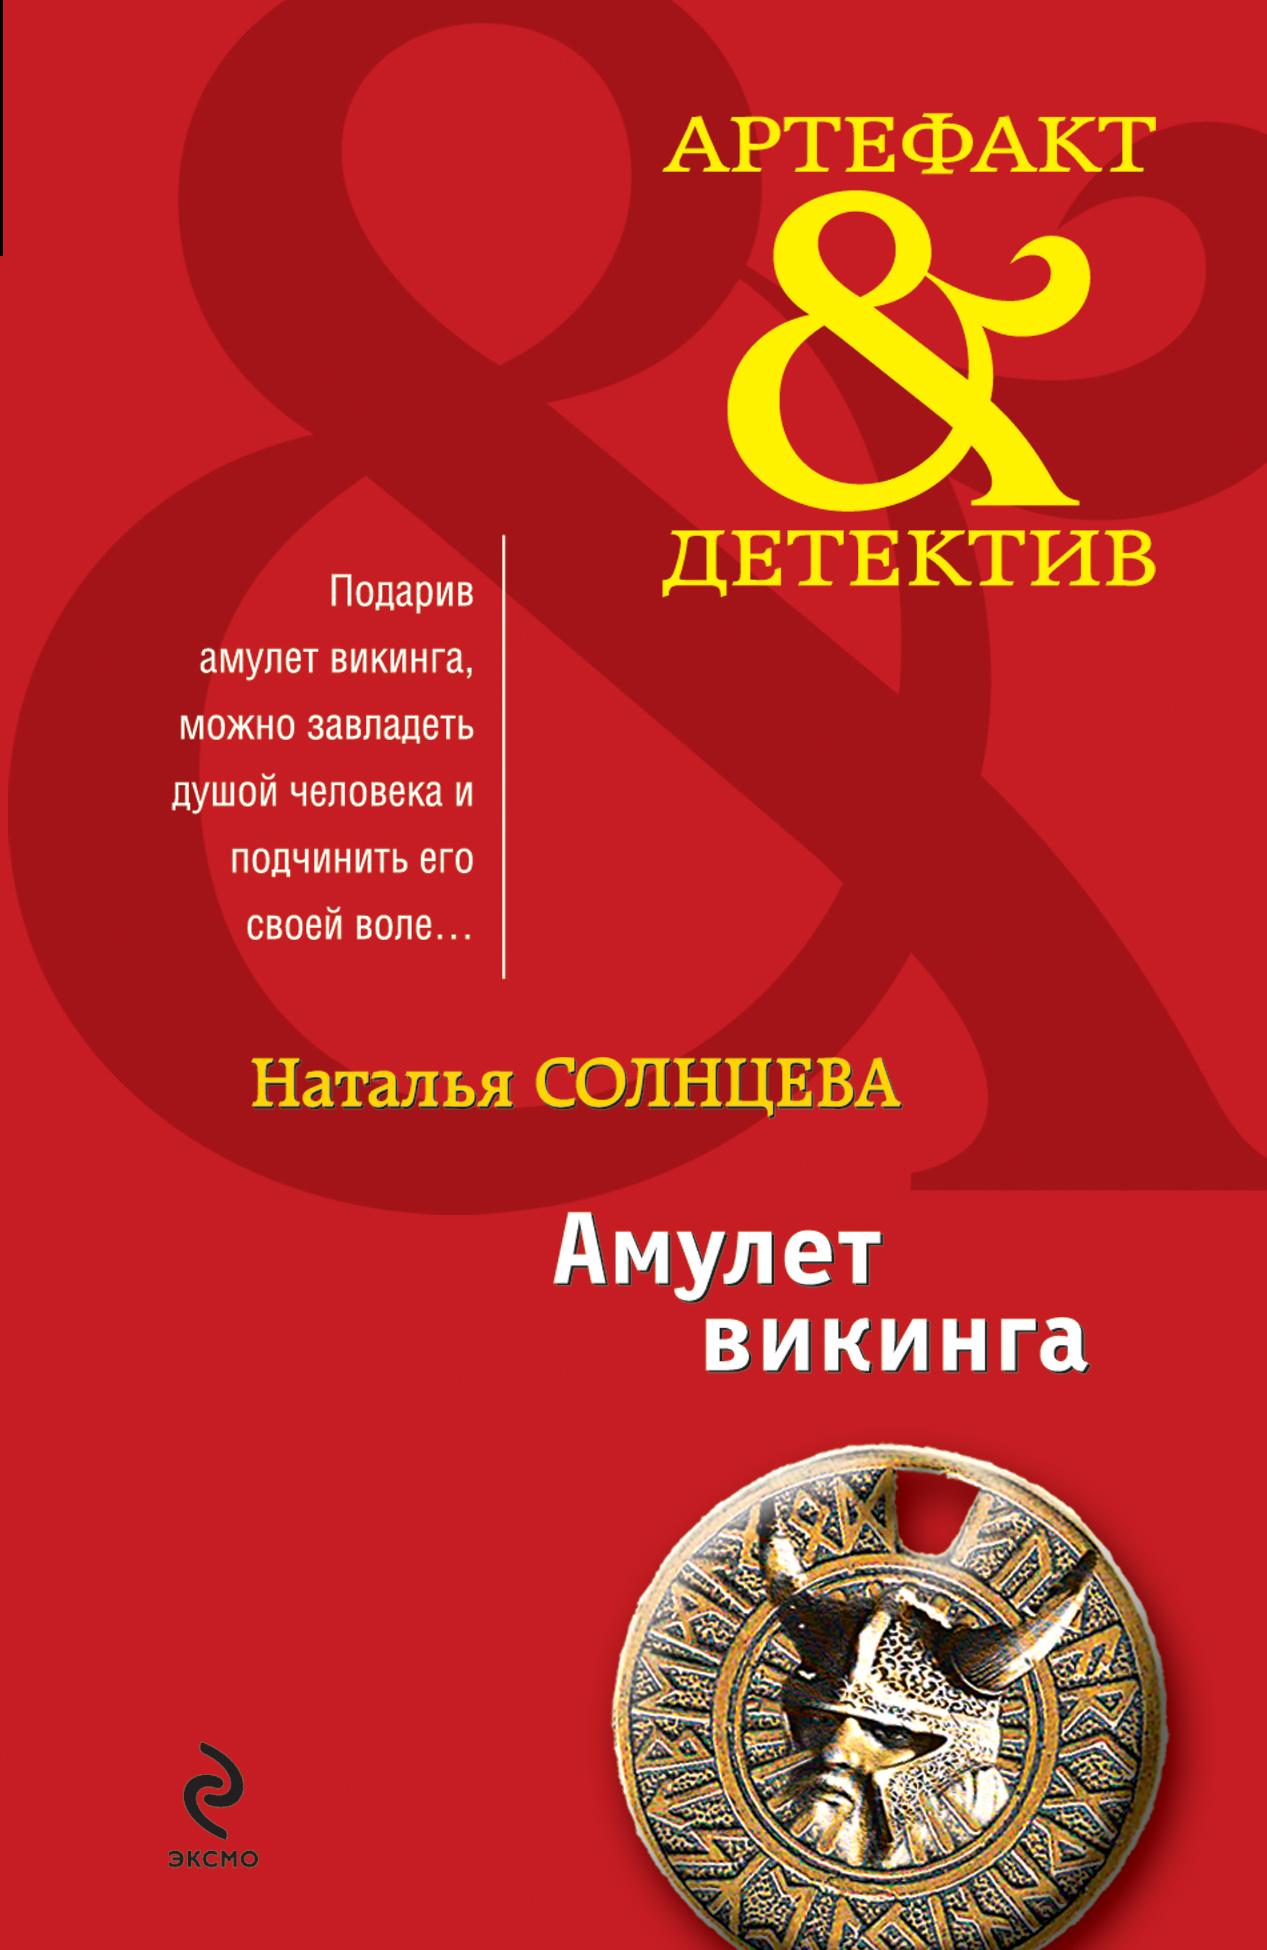 Наталья Солнцева Медальон наталья солнцева часы королевского астролога